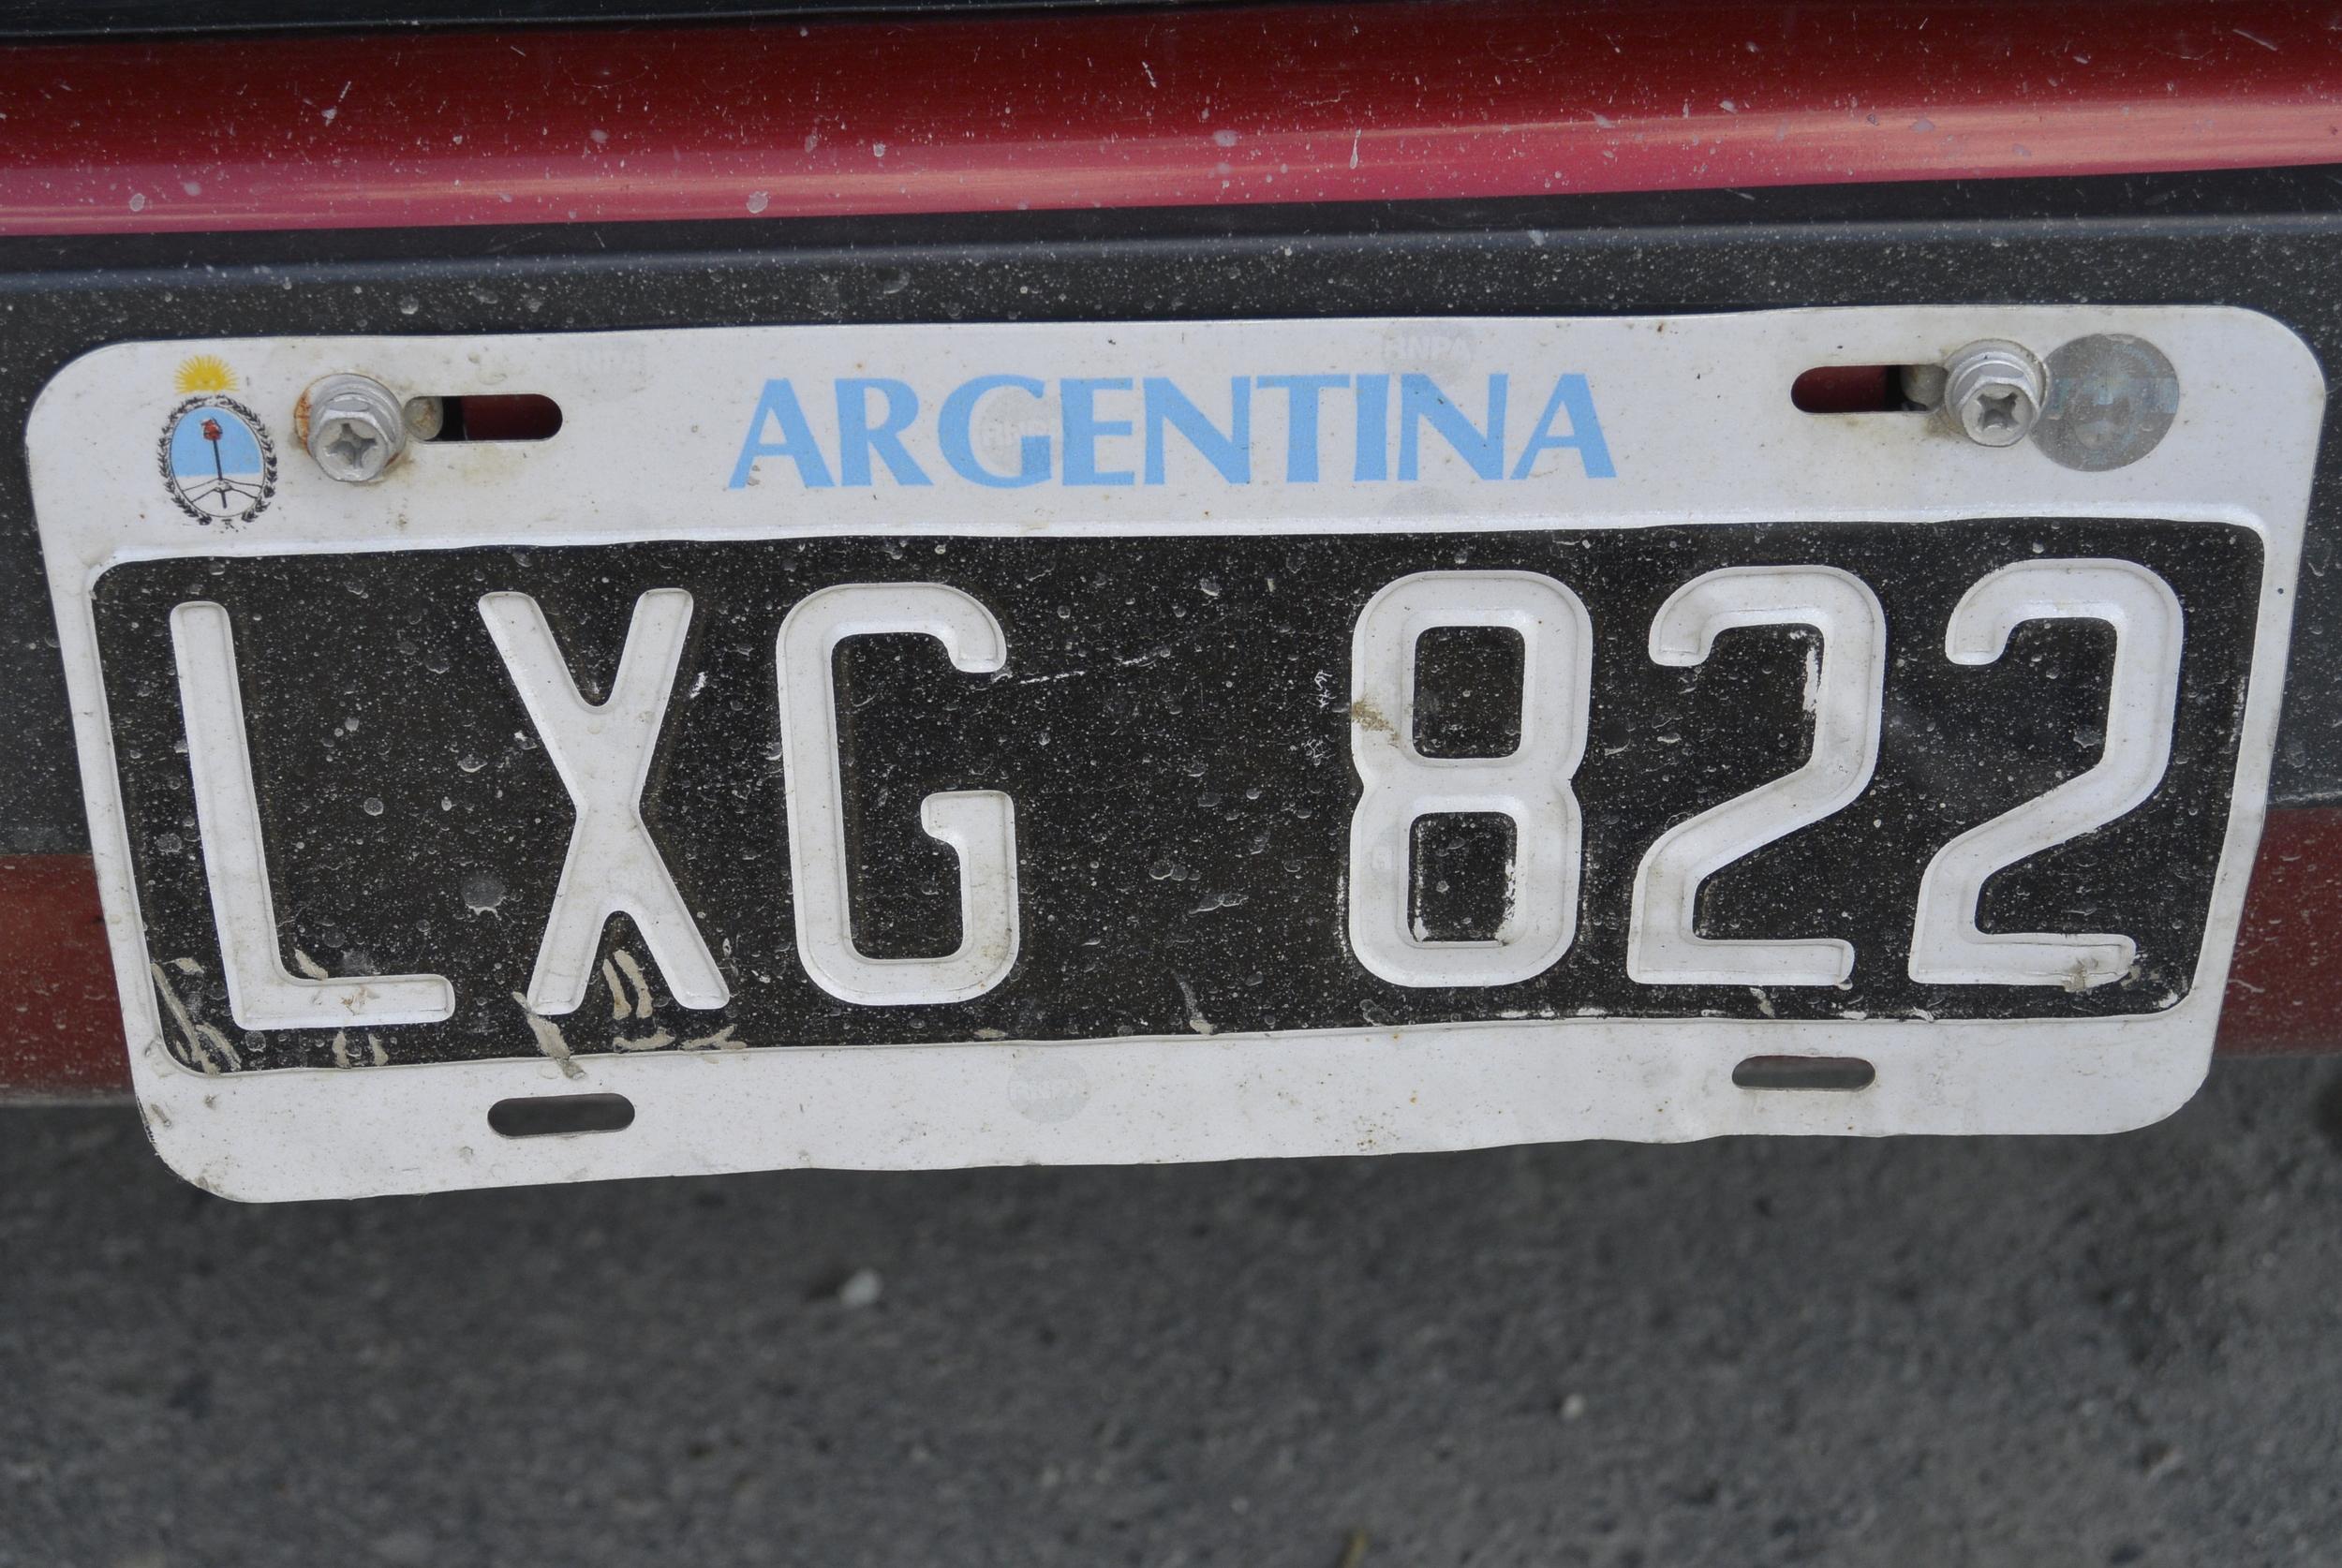 Ushuaia Argentina Car License Plate